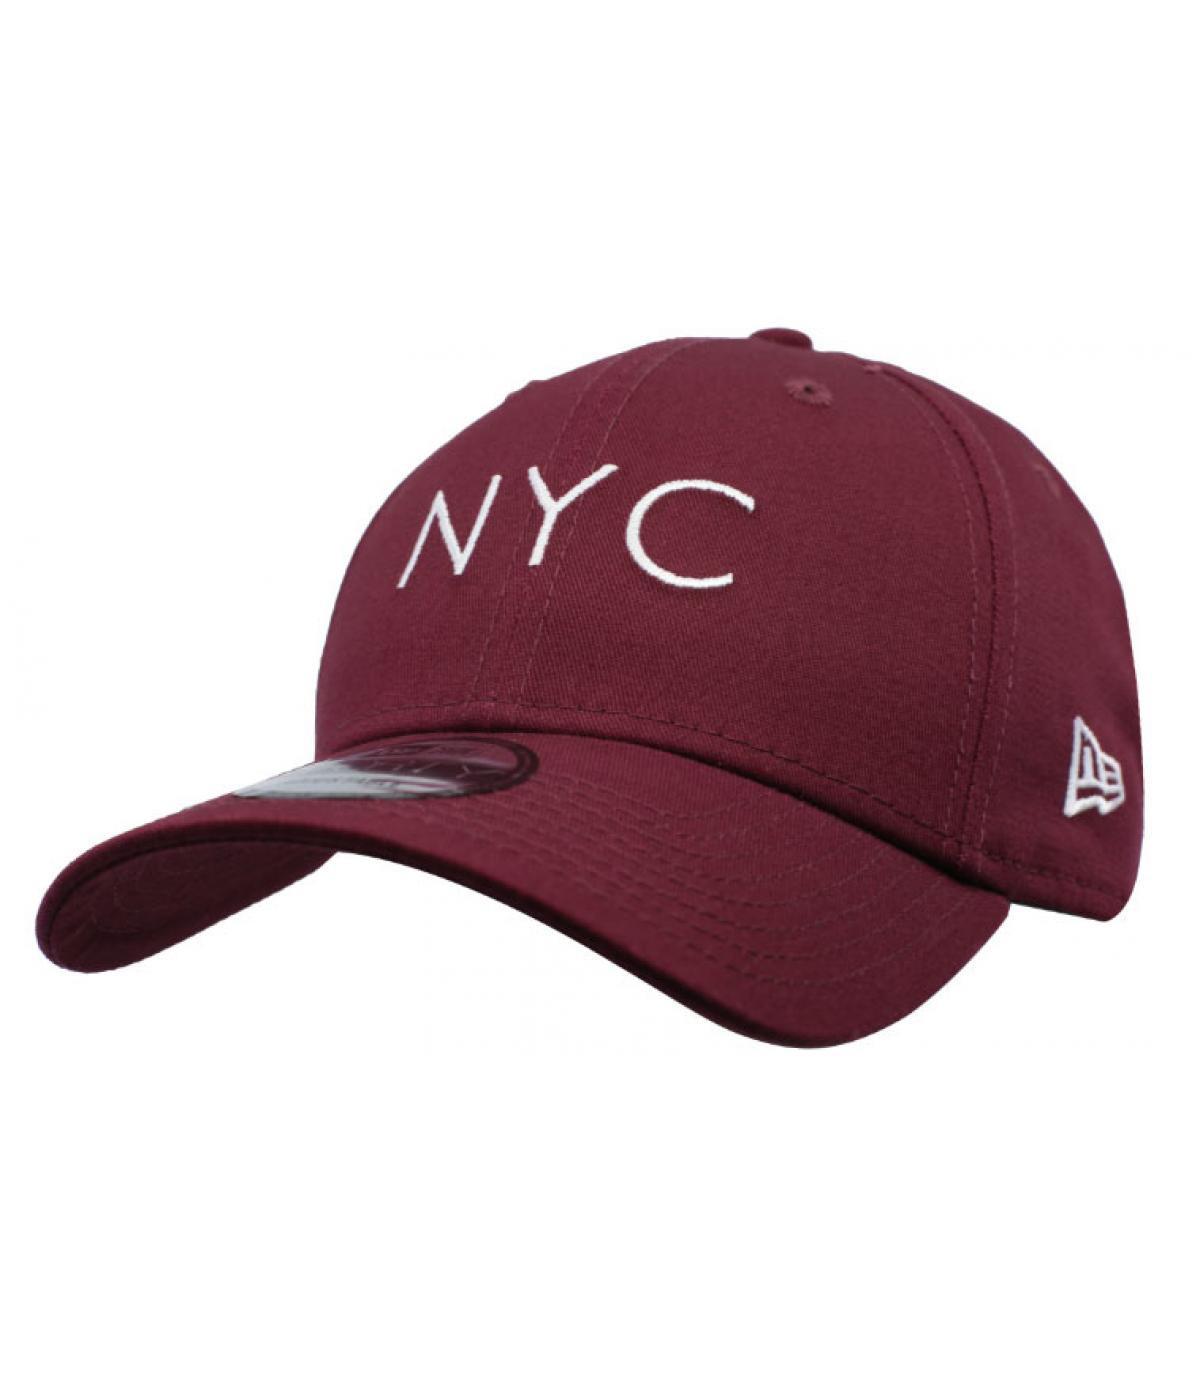 Details NYC NE Ess 9Forty maroon - afbeeling 2